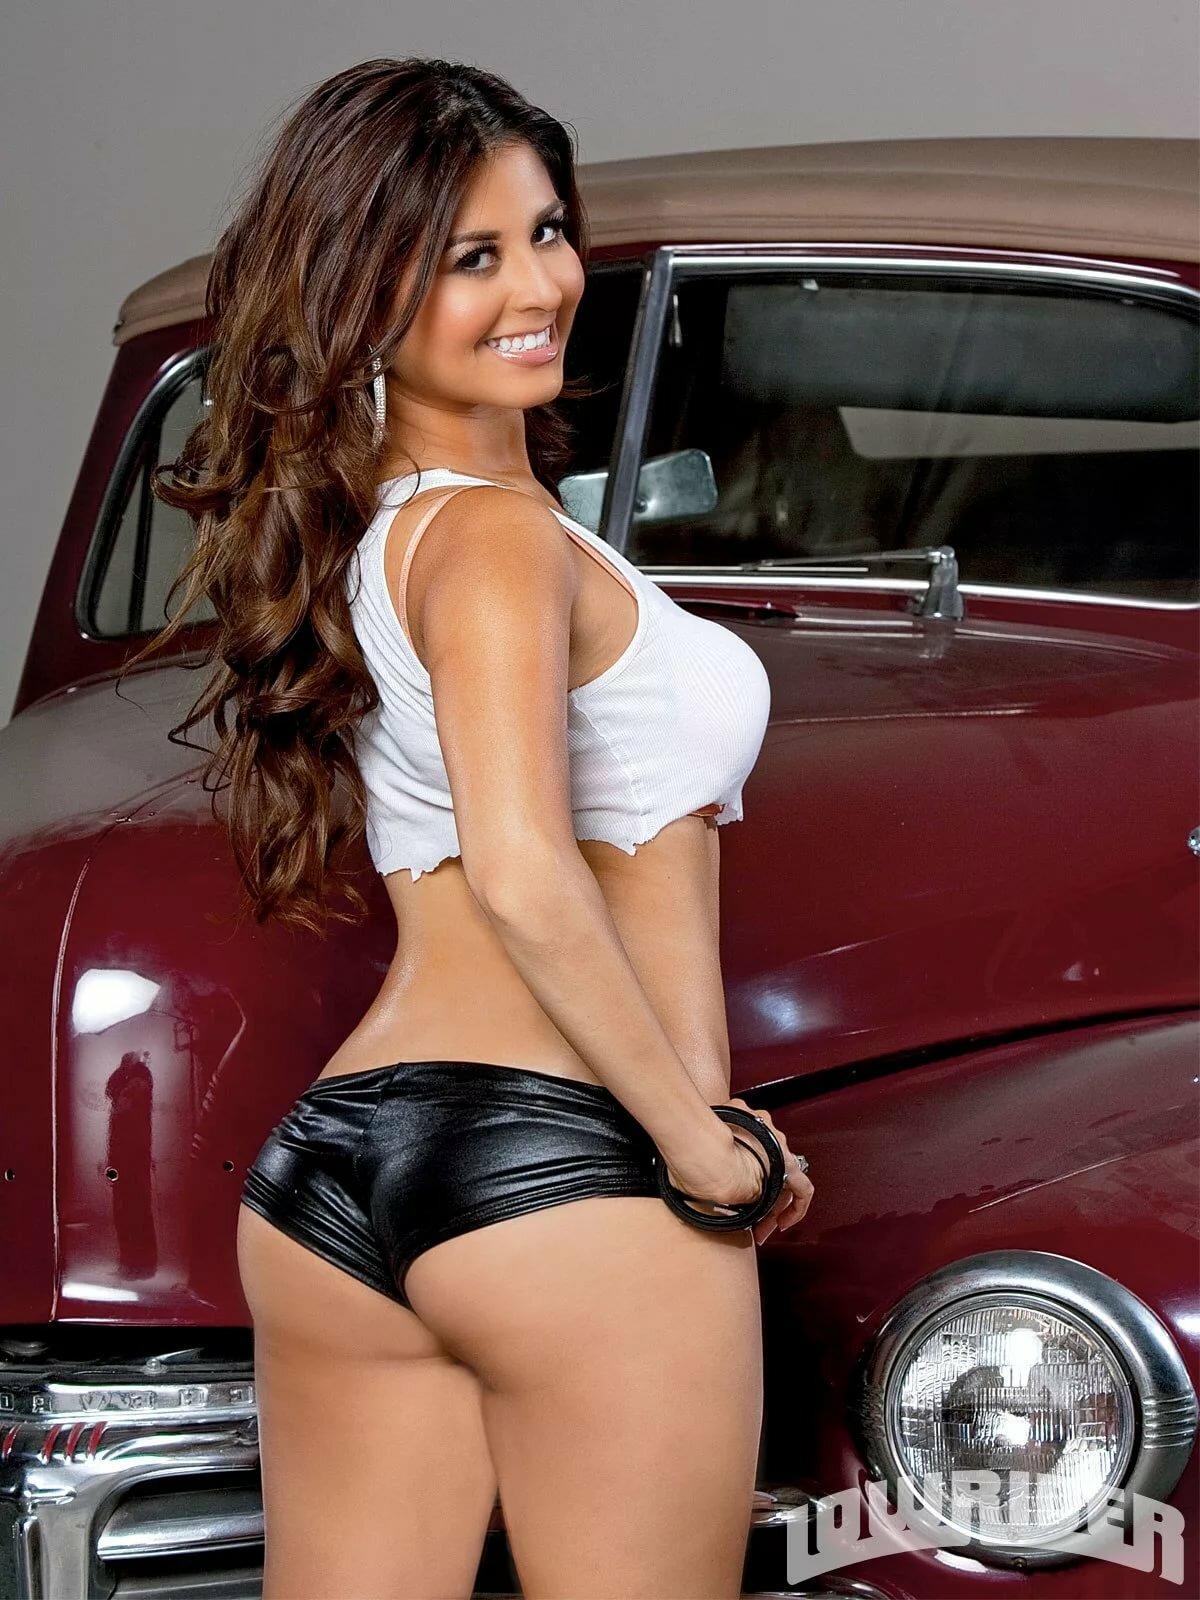 Latina lowrider girls nude